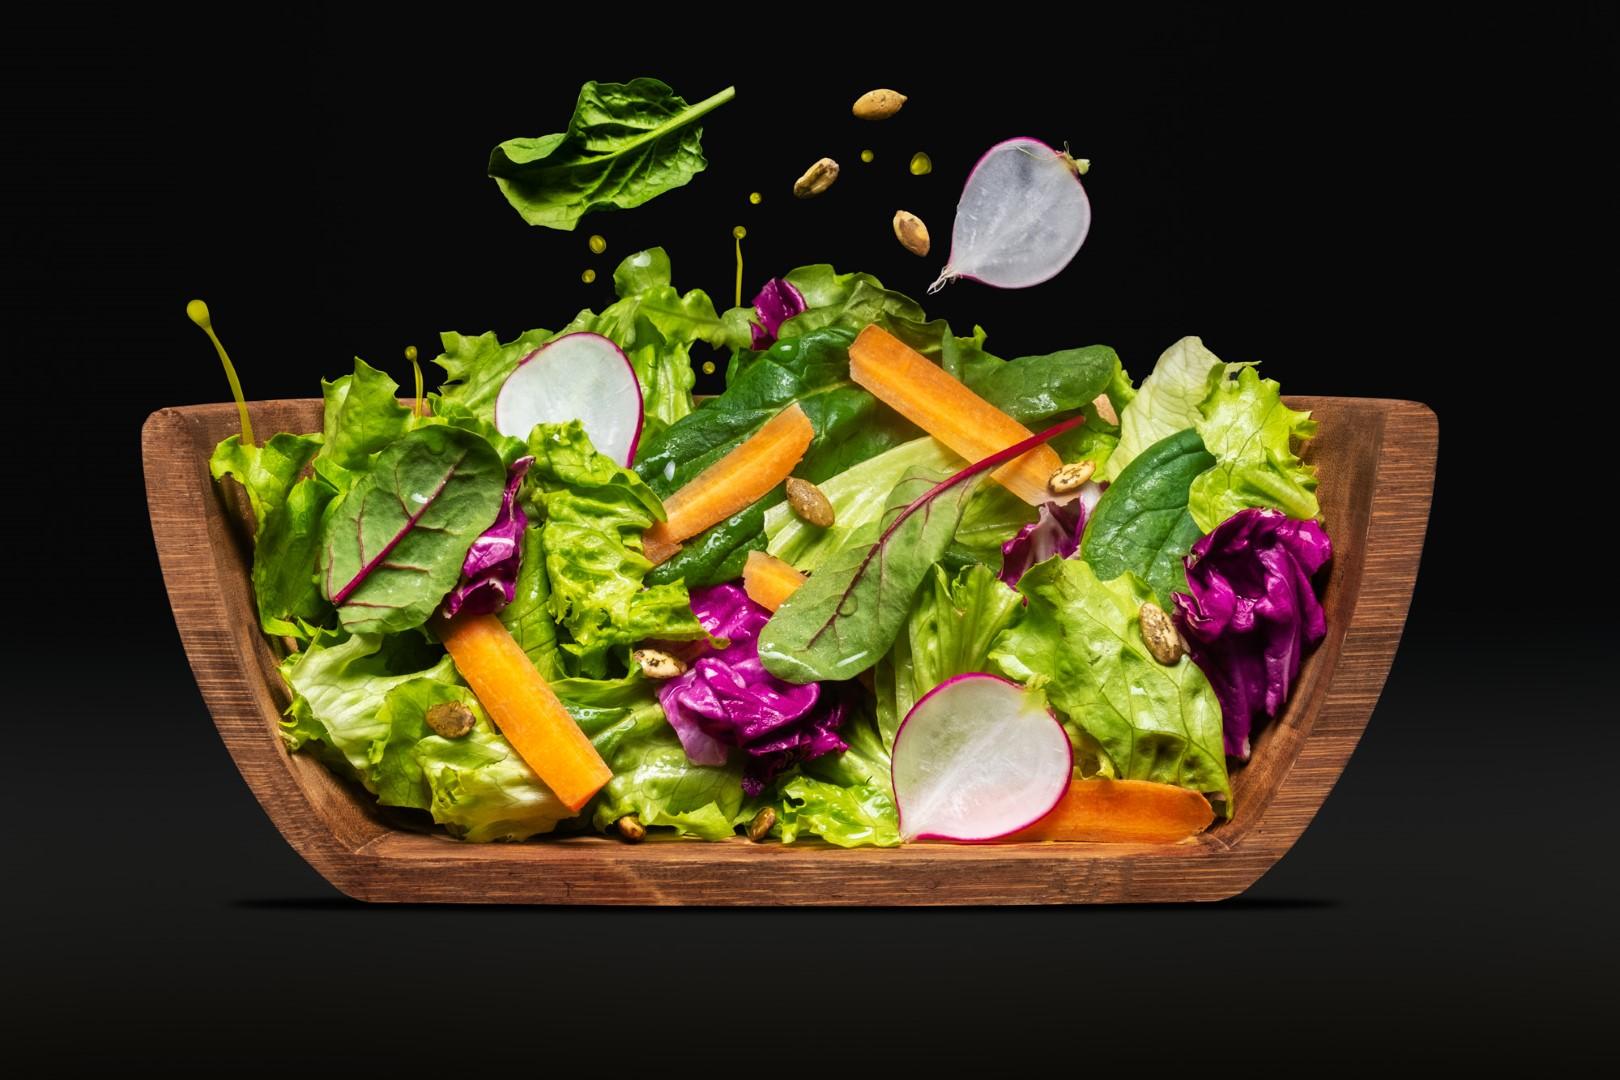 Plant-based prehrana